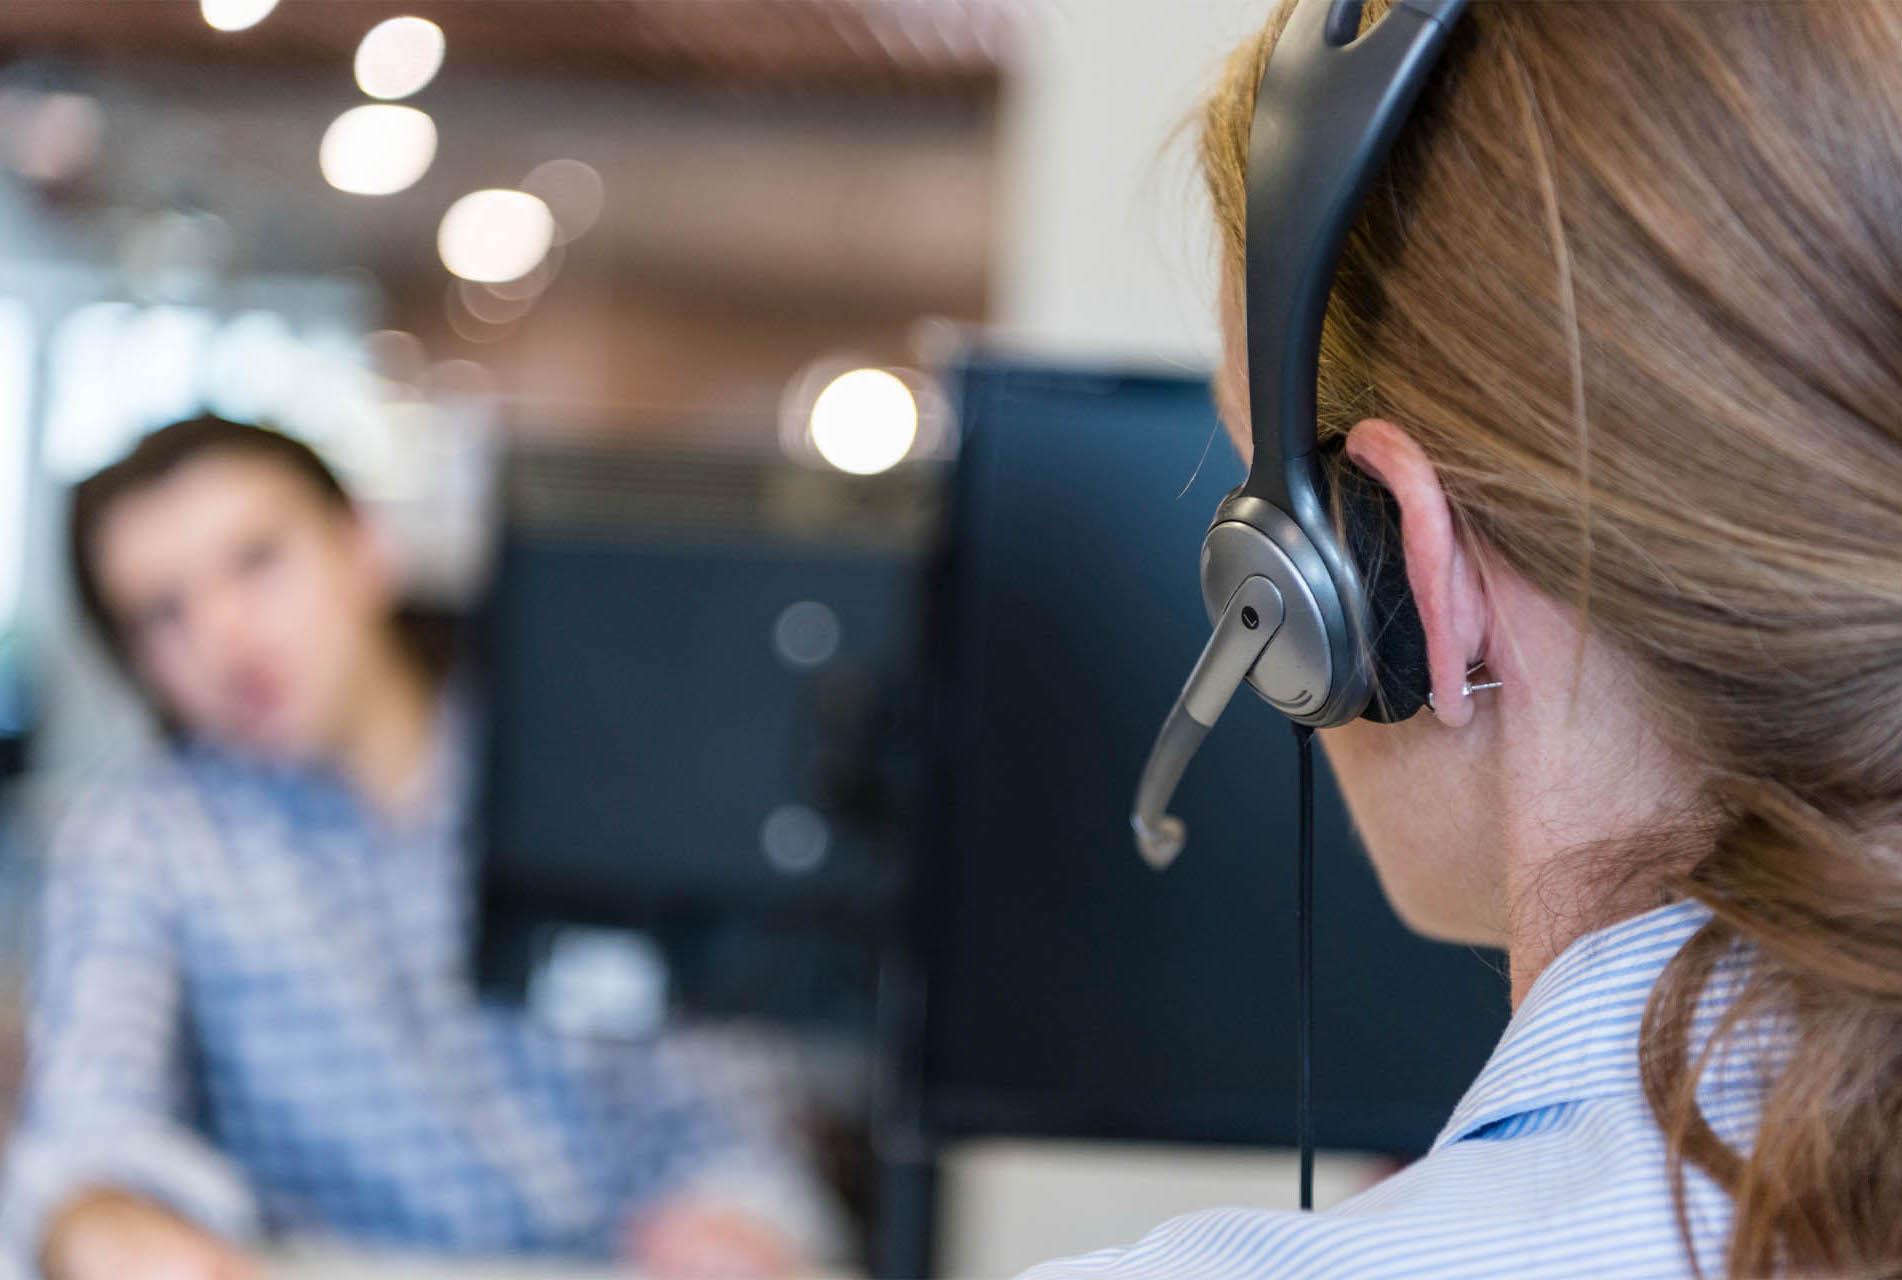 img_0009_female-support-phone-operator-PM2RKXR2-min